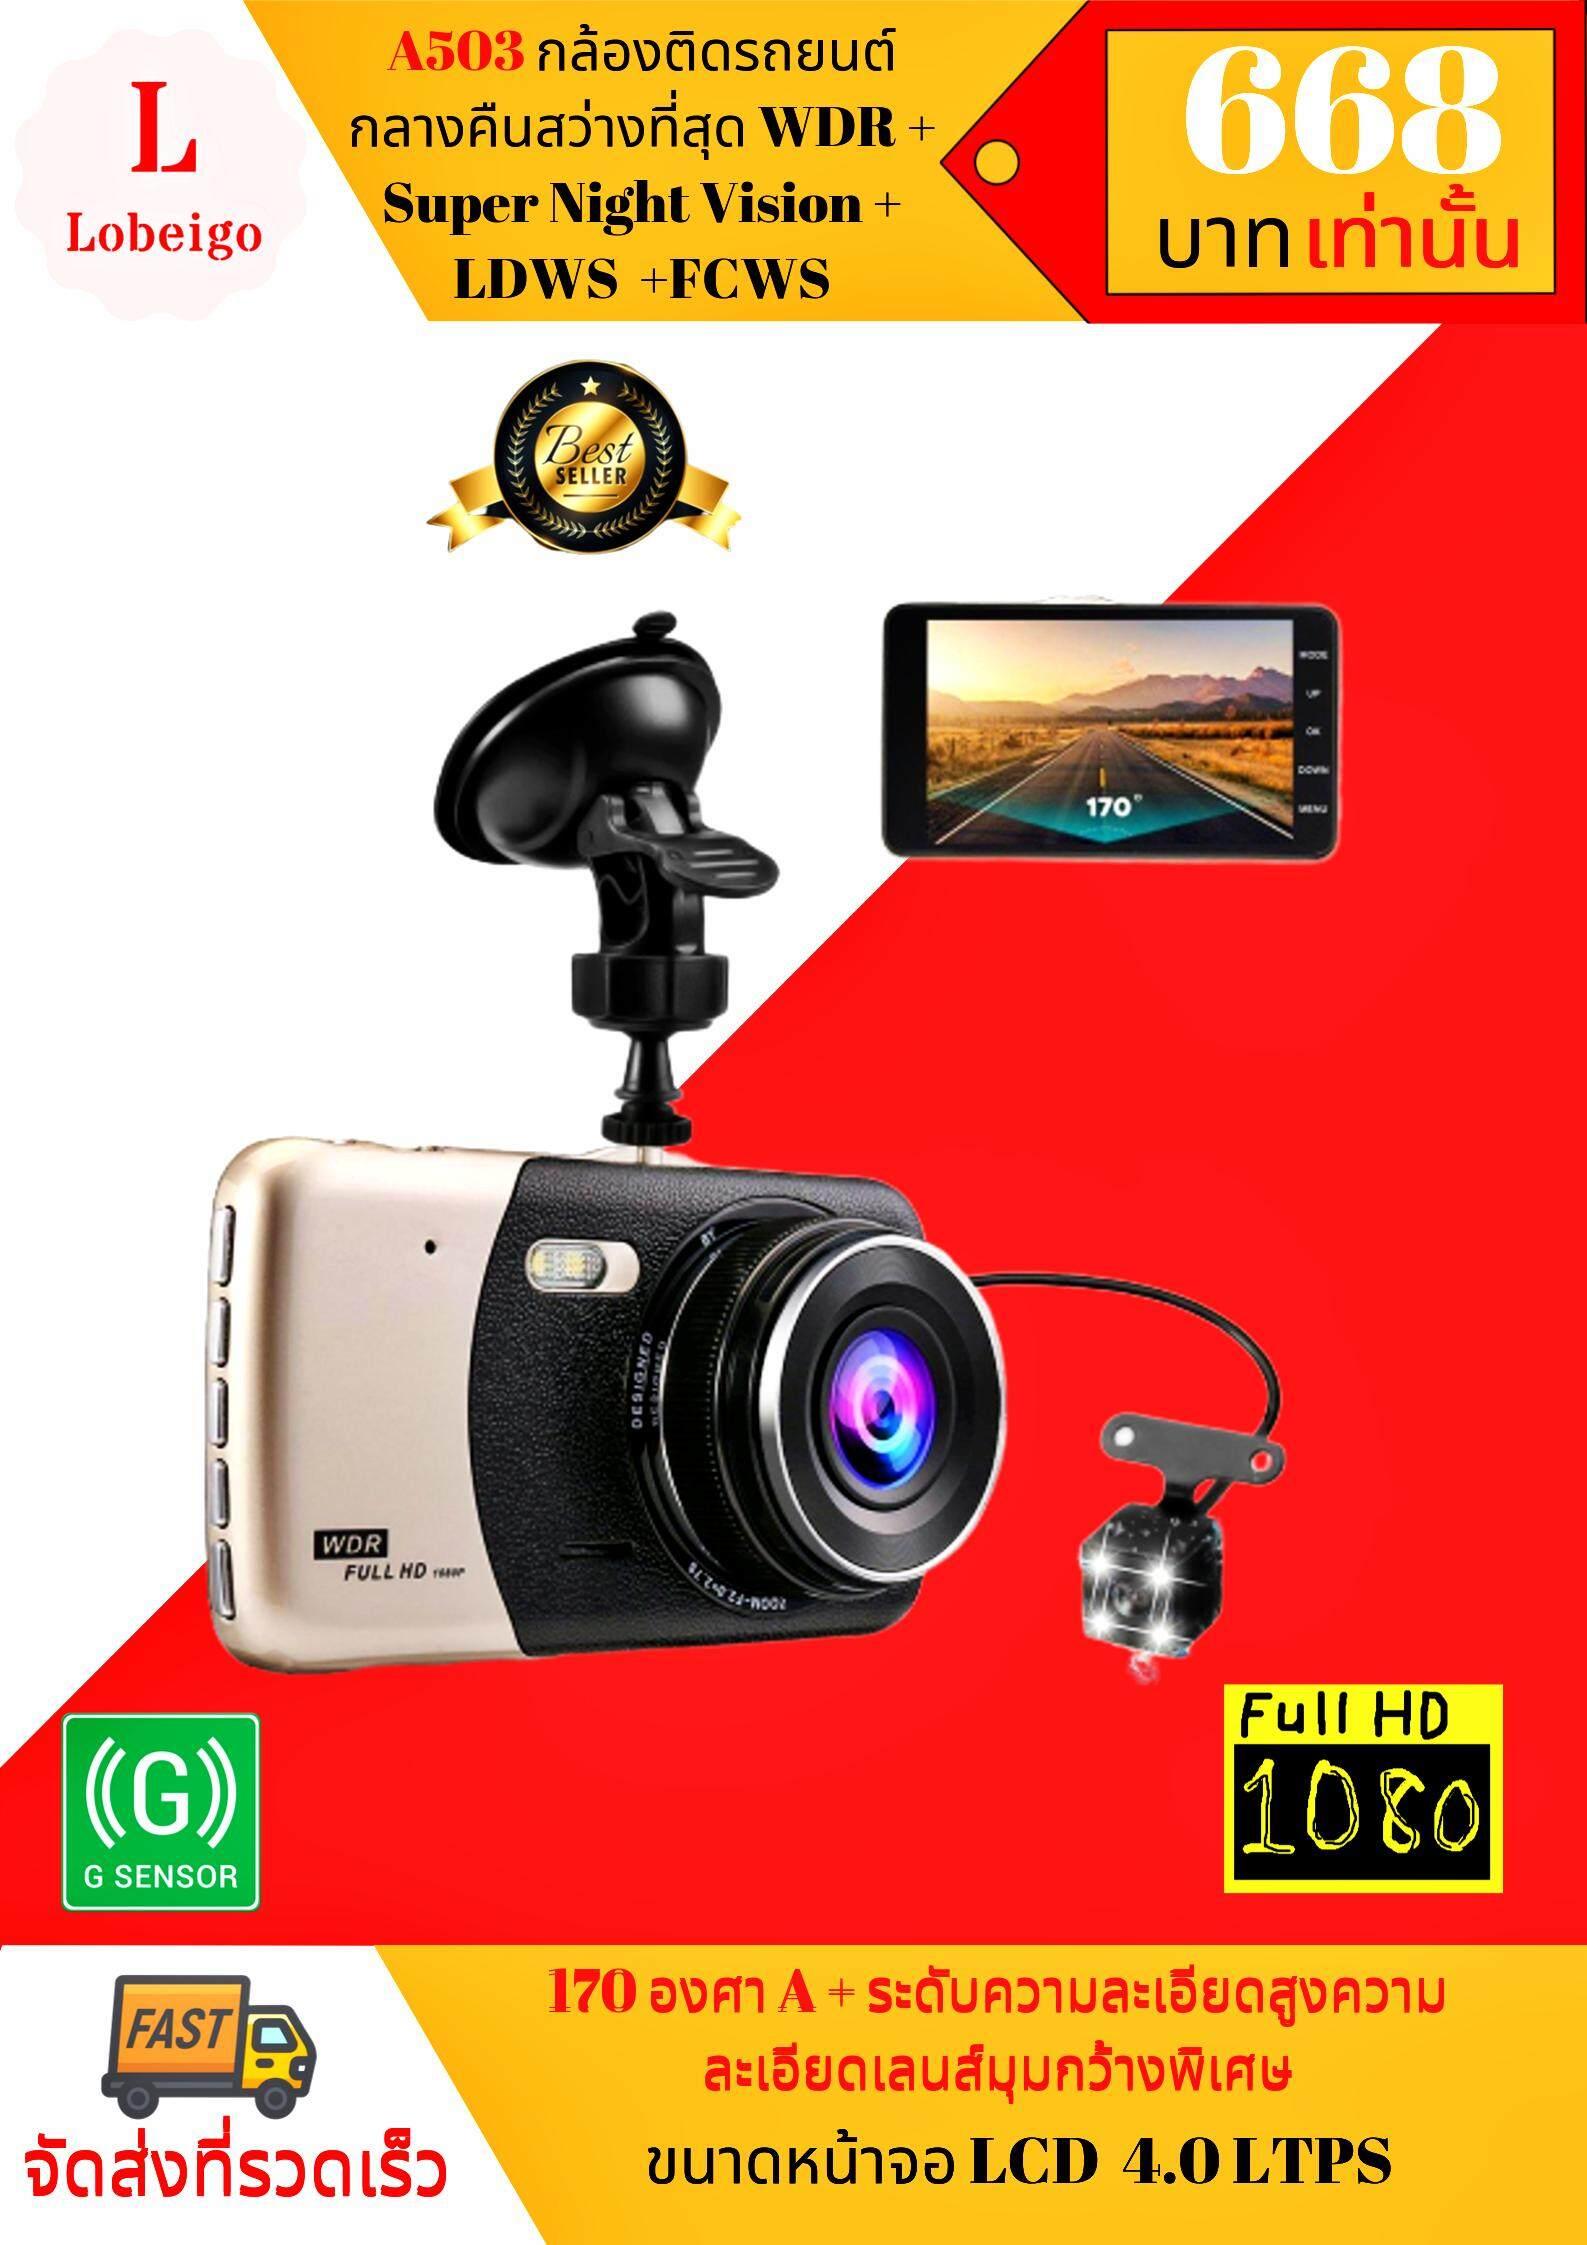 A503กล้องติดรถยนต์ กลางคืนสว่างที่สุด Wdr + Super Night Vision + Ldws (เตือนออกนอกเลนส์) +fcws (เตือนรถใกล้คันหน้าเกินไป) + Parking Monitor บอดี้โลหะ จอใหญ่ 3.0นิ้ว Fhd 1080p เมนูไทย รุ่น T990se (silver) - มีคลิปวีดีโอในซอยมืดเปรียบเทียบกั.